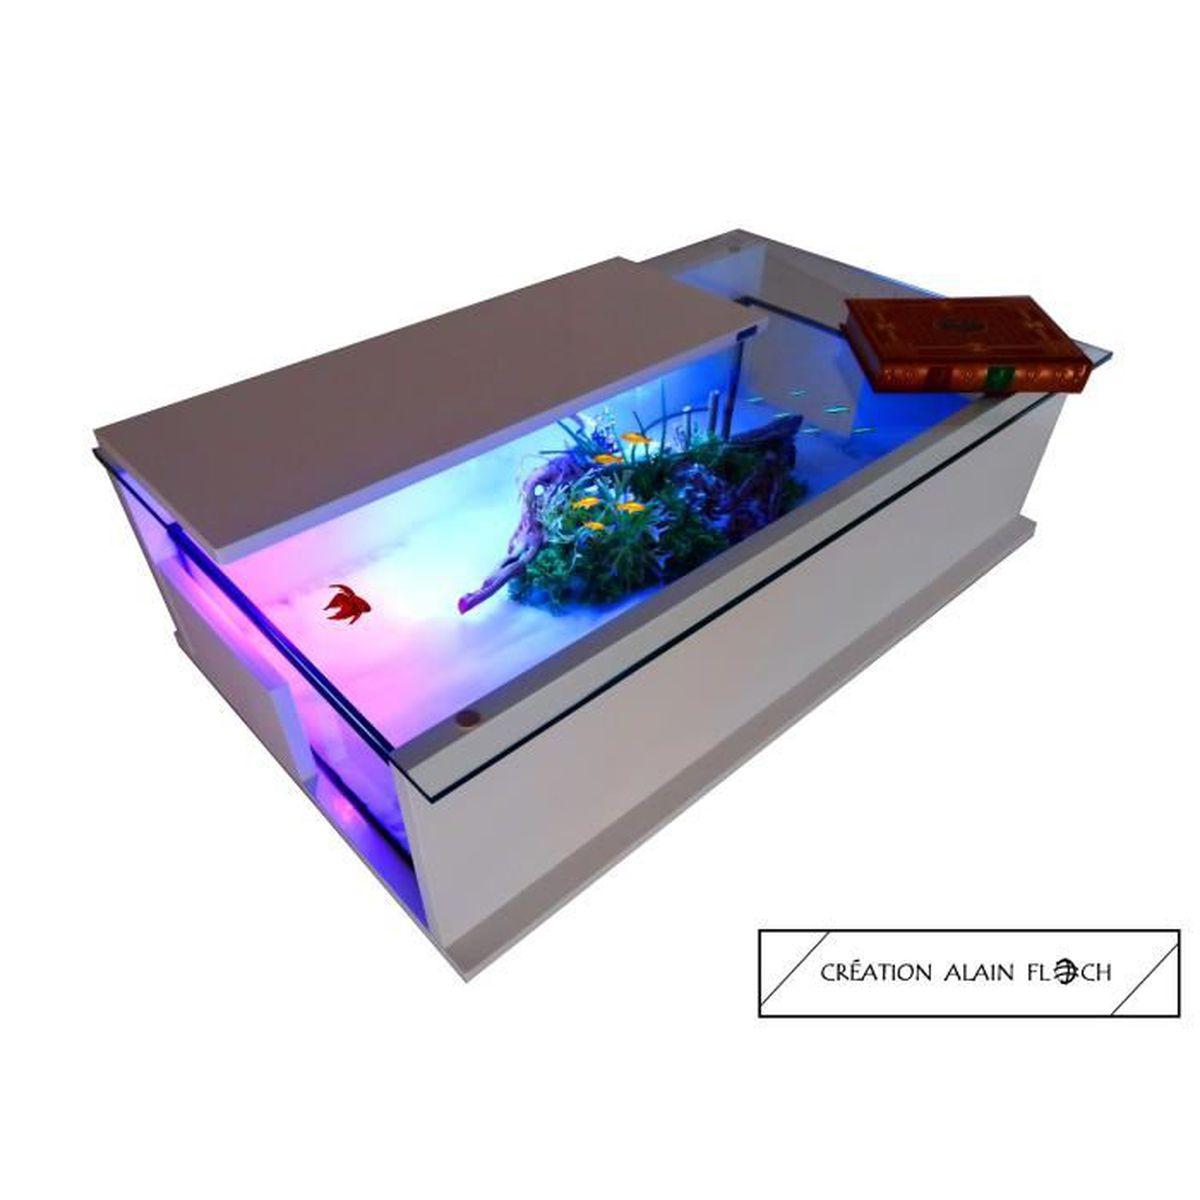 Table Basse Terrarium A Vendre table basse aquarium terrarium blanca avec 5 roulettes